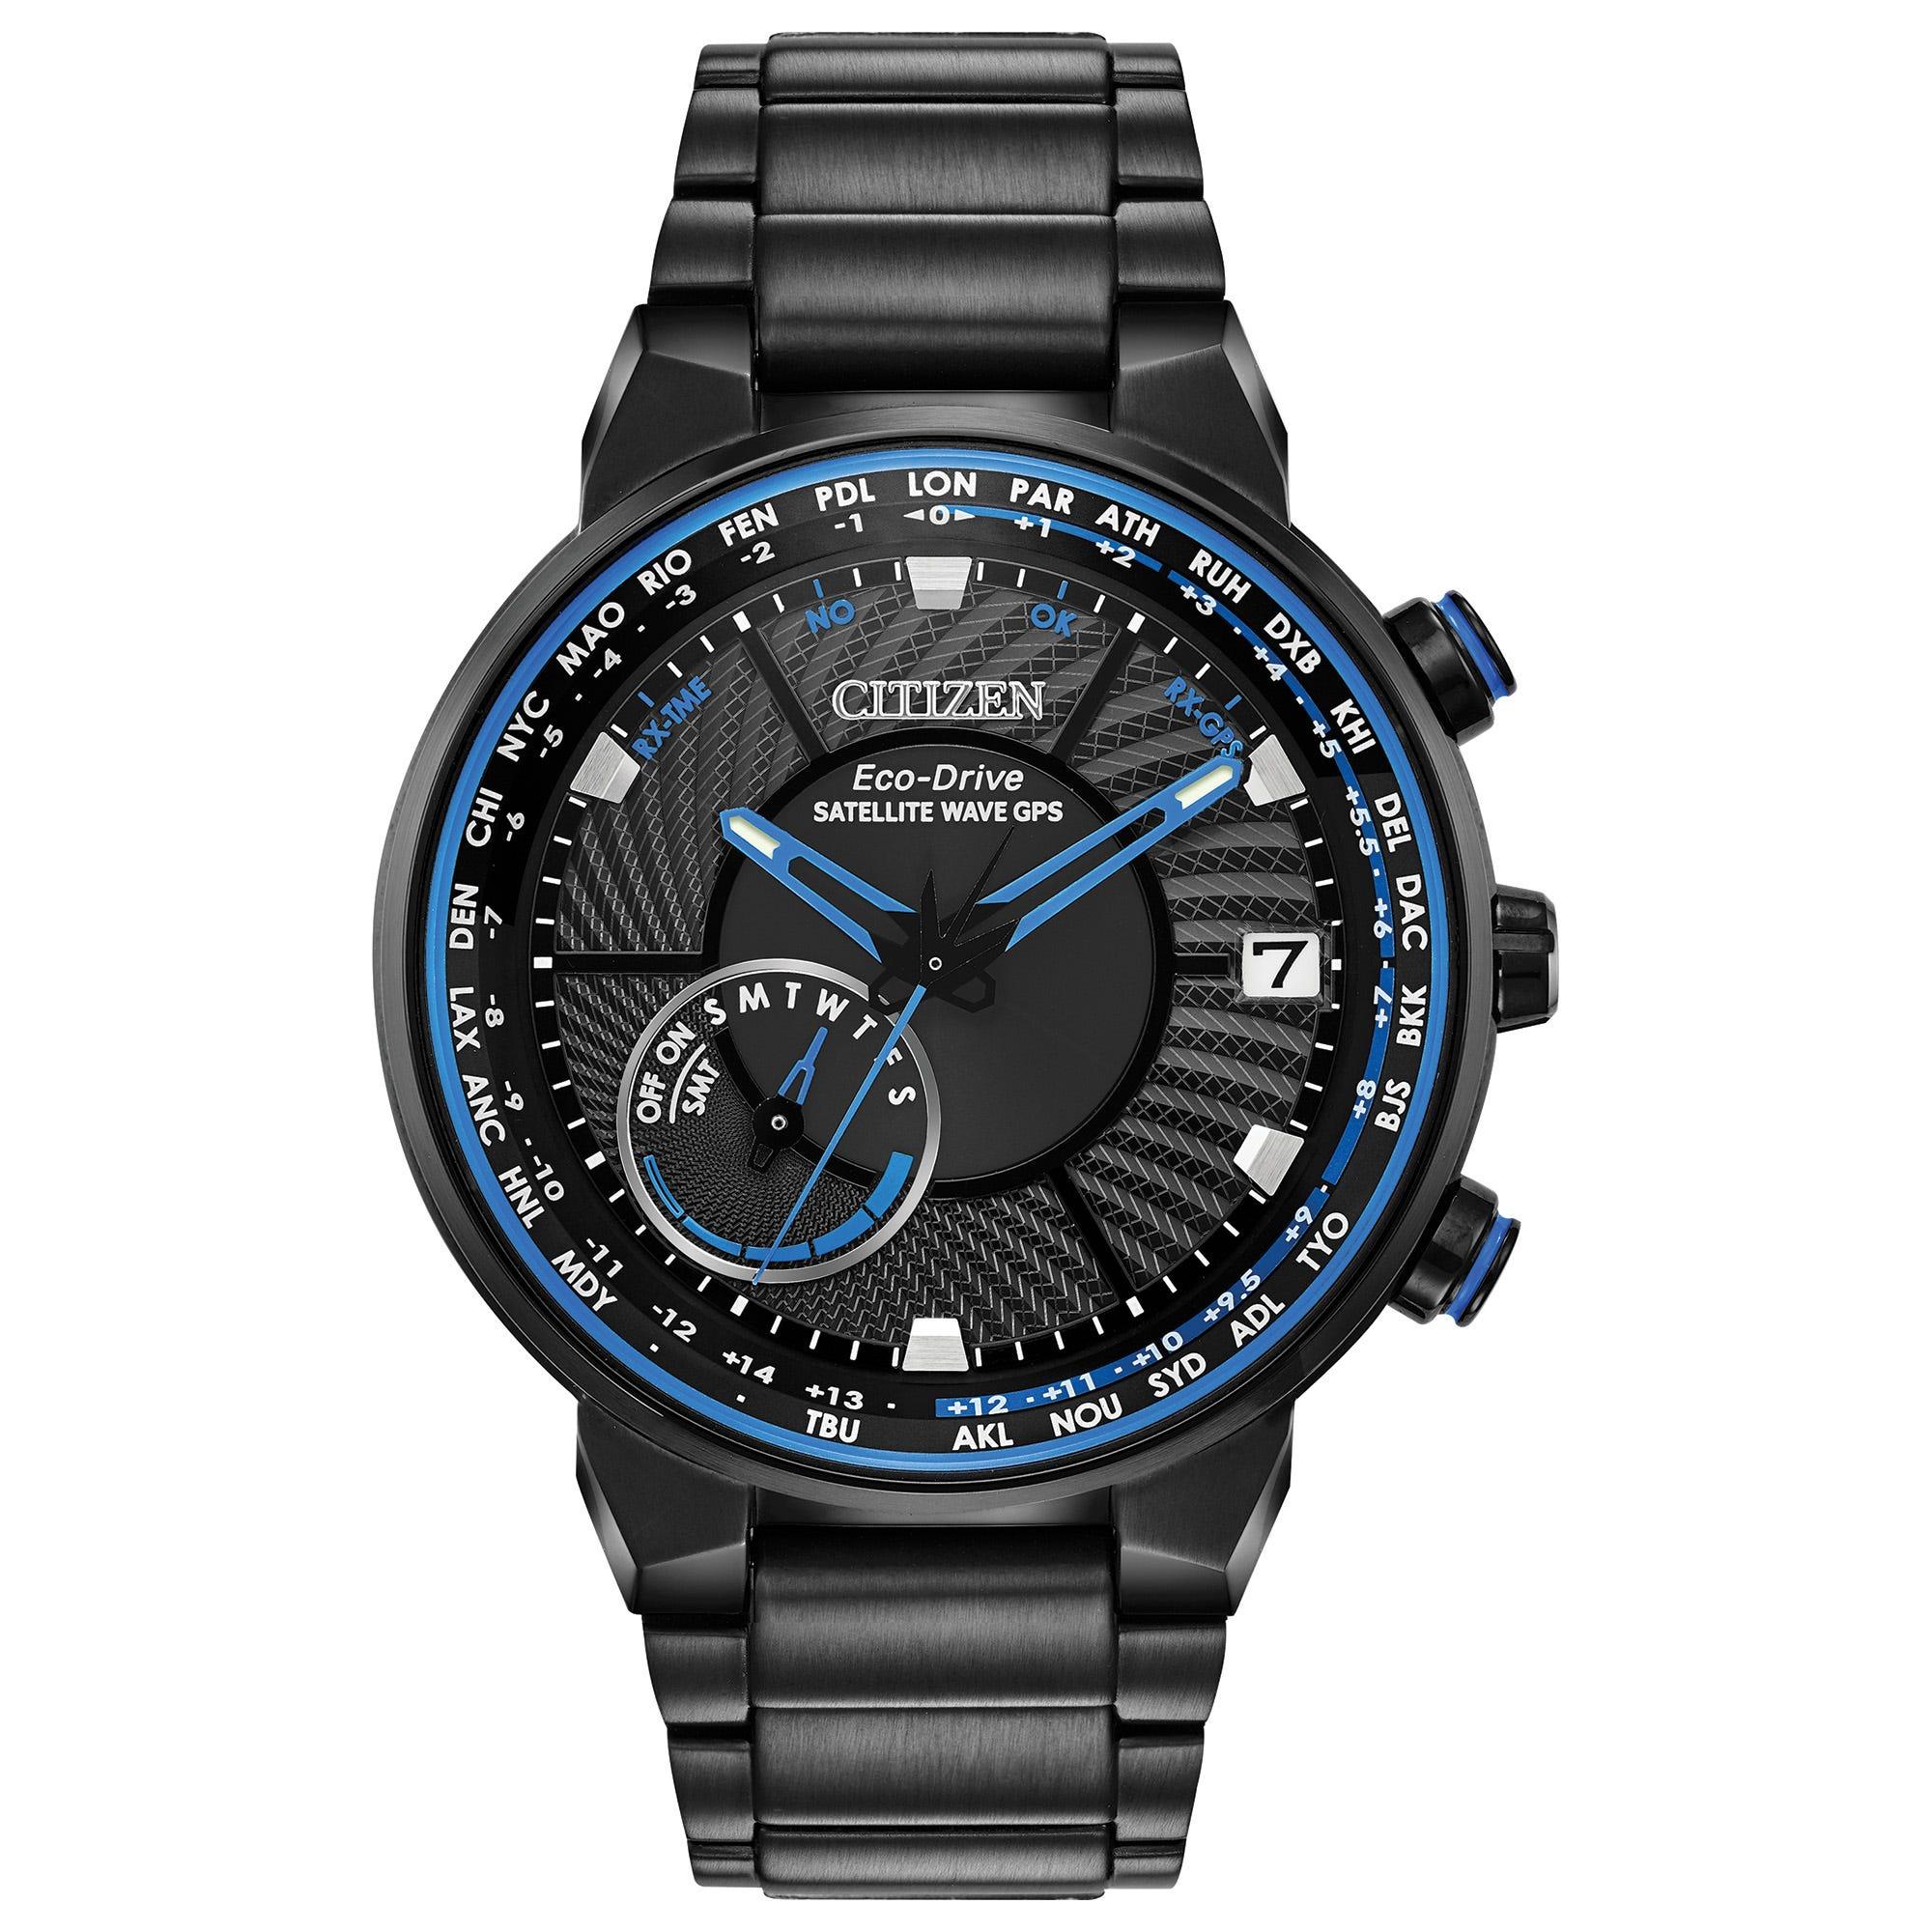 Citizen Men's Satellite Wave GPS Freedom Watch CC3038-51E